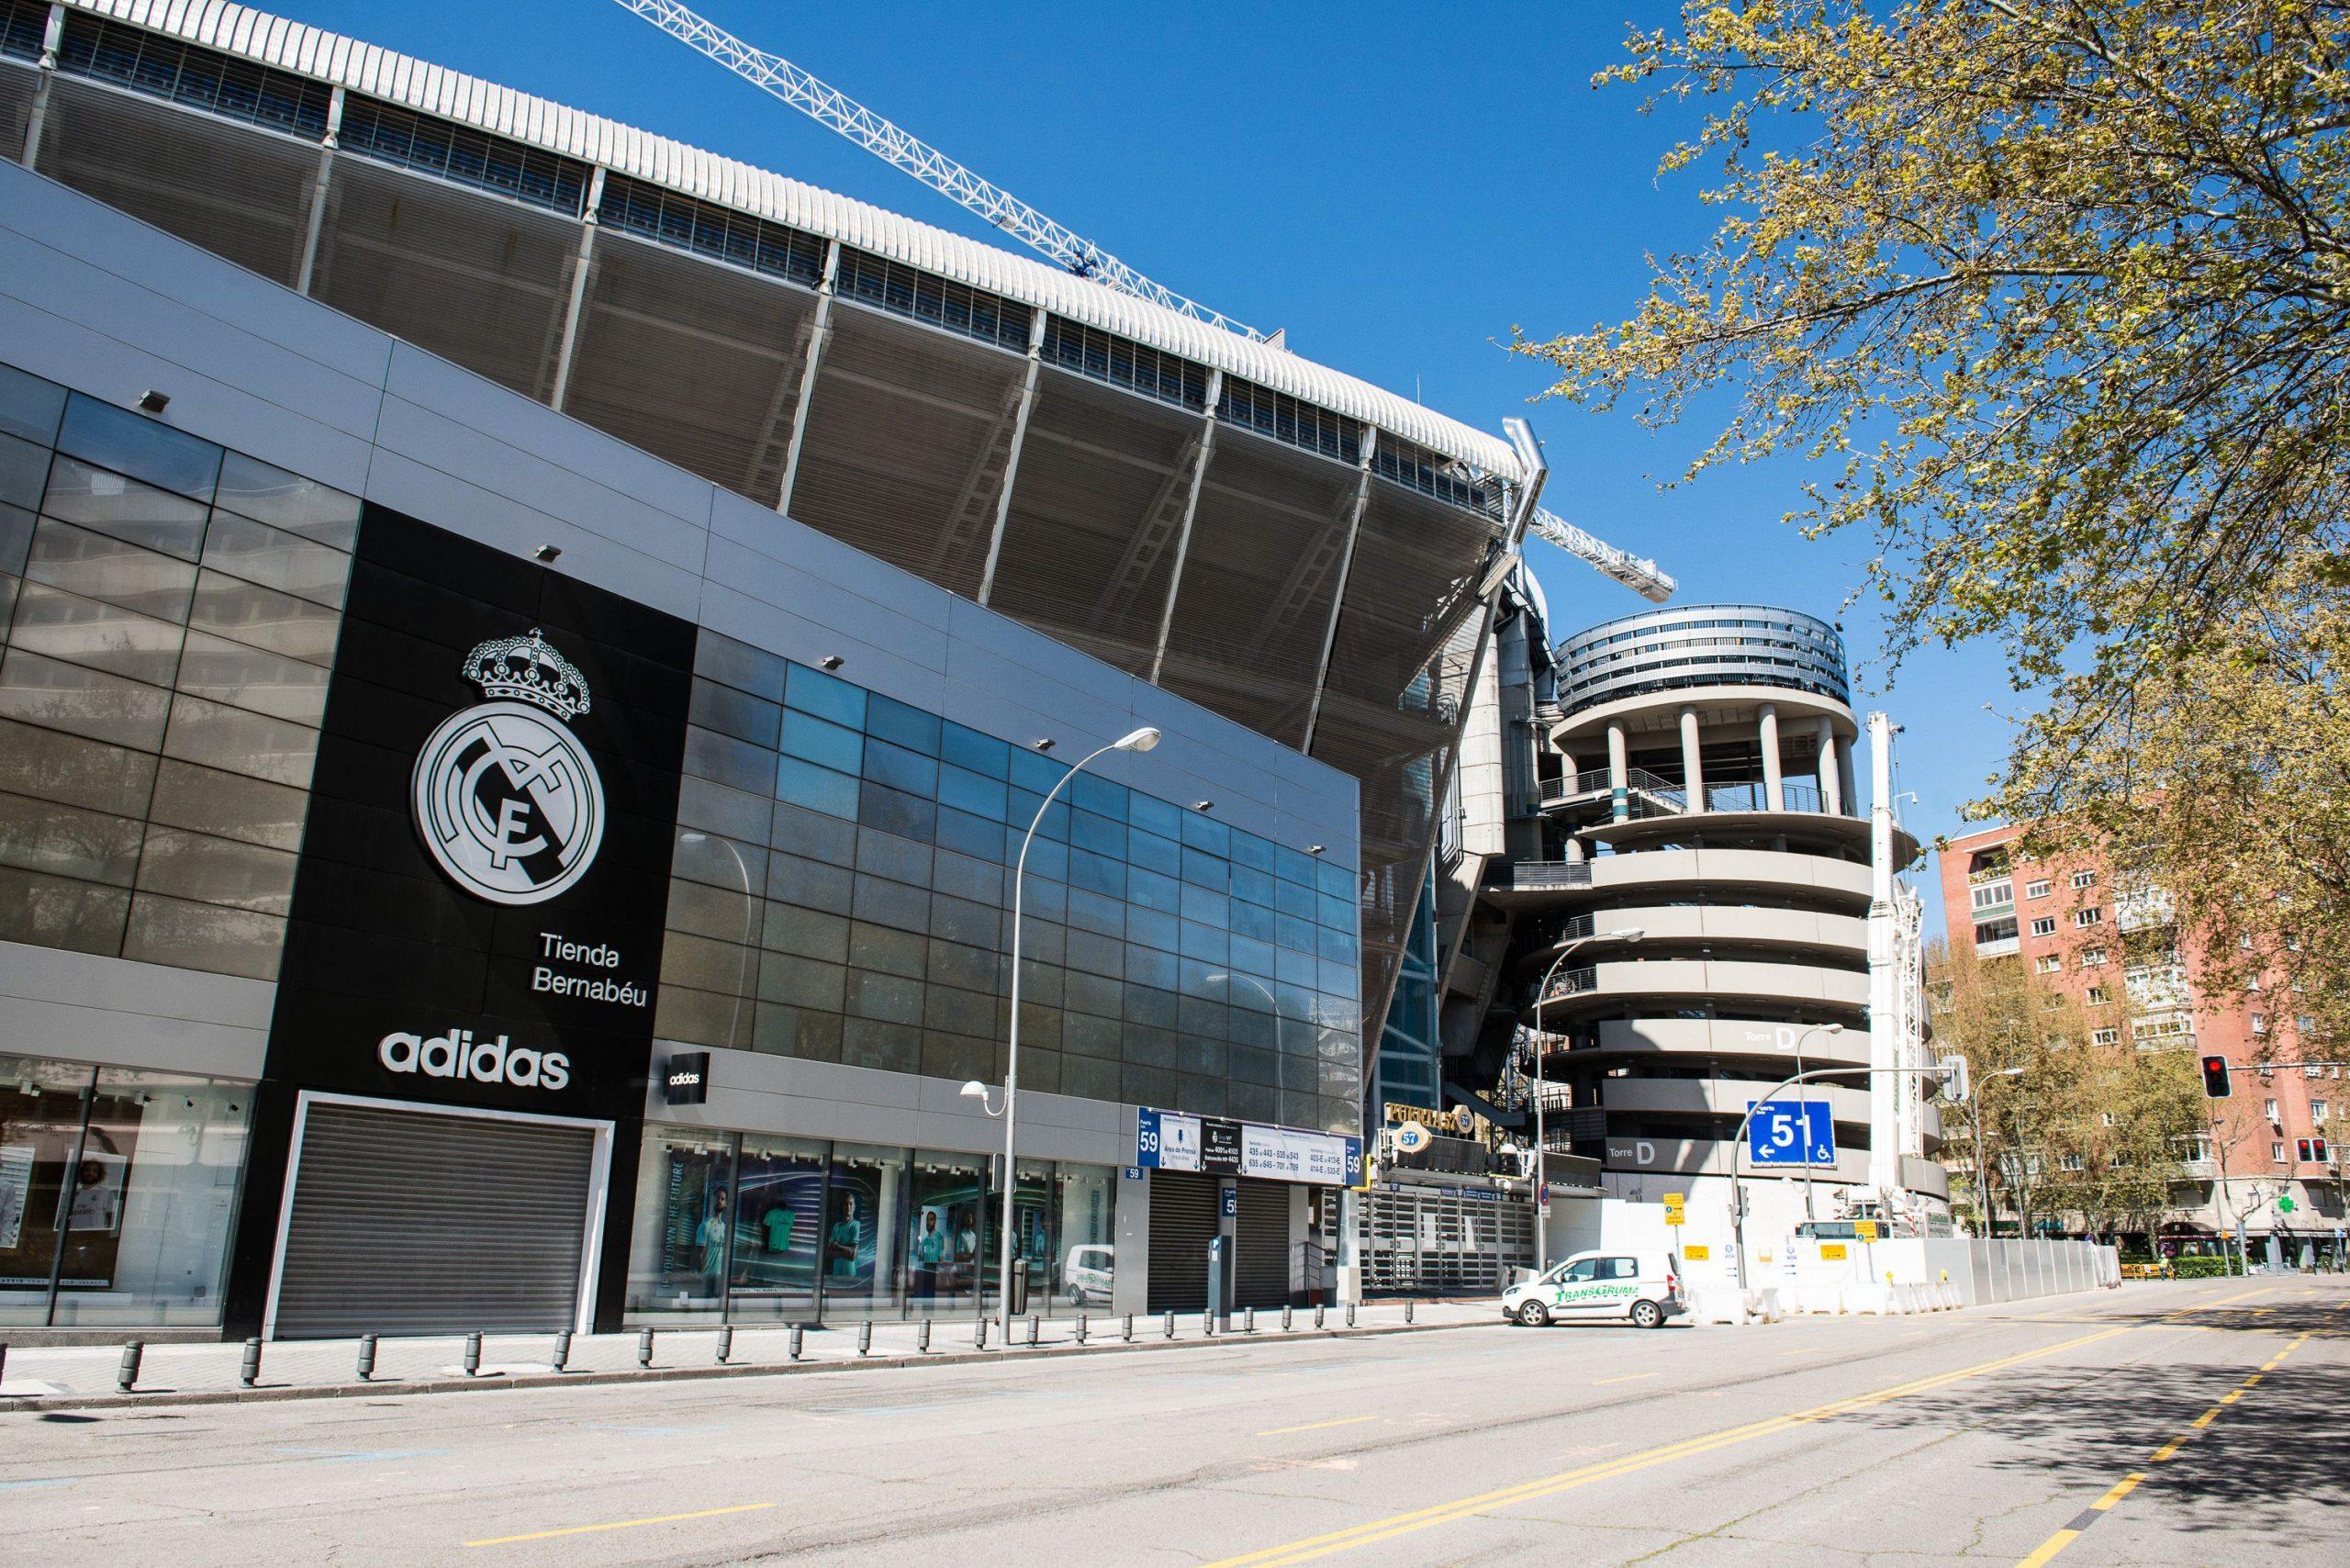 Real Madrid revine pe Santiago Bernabeu